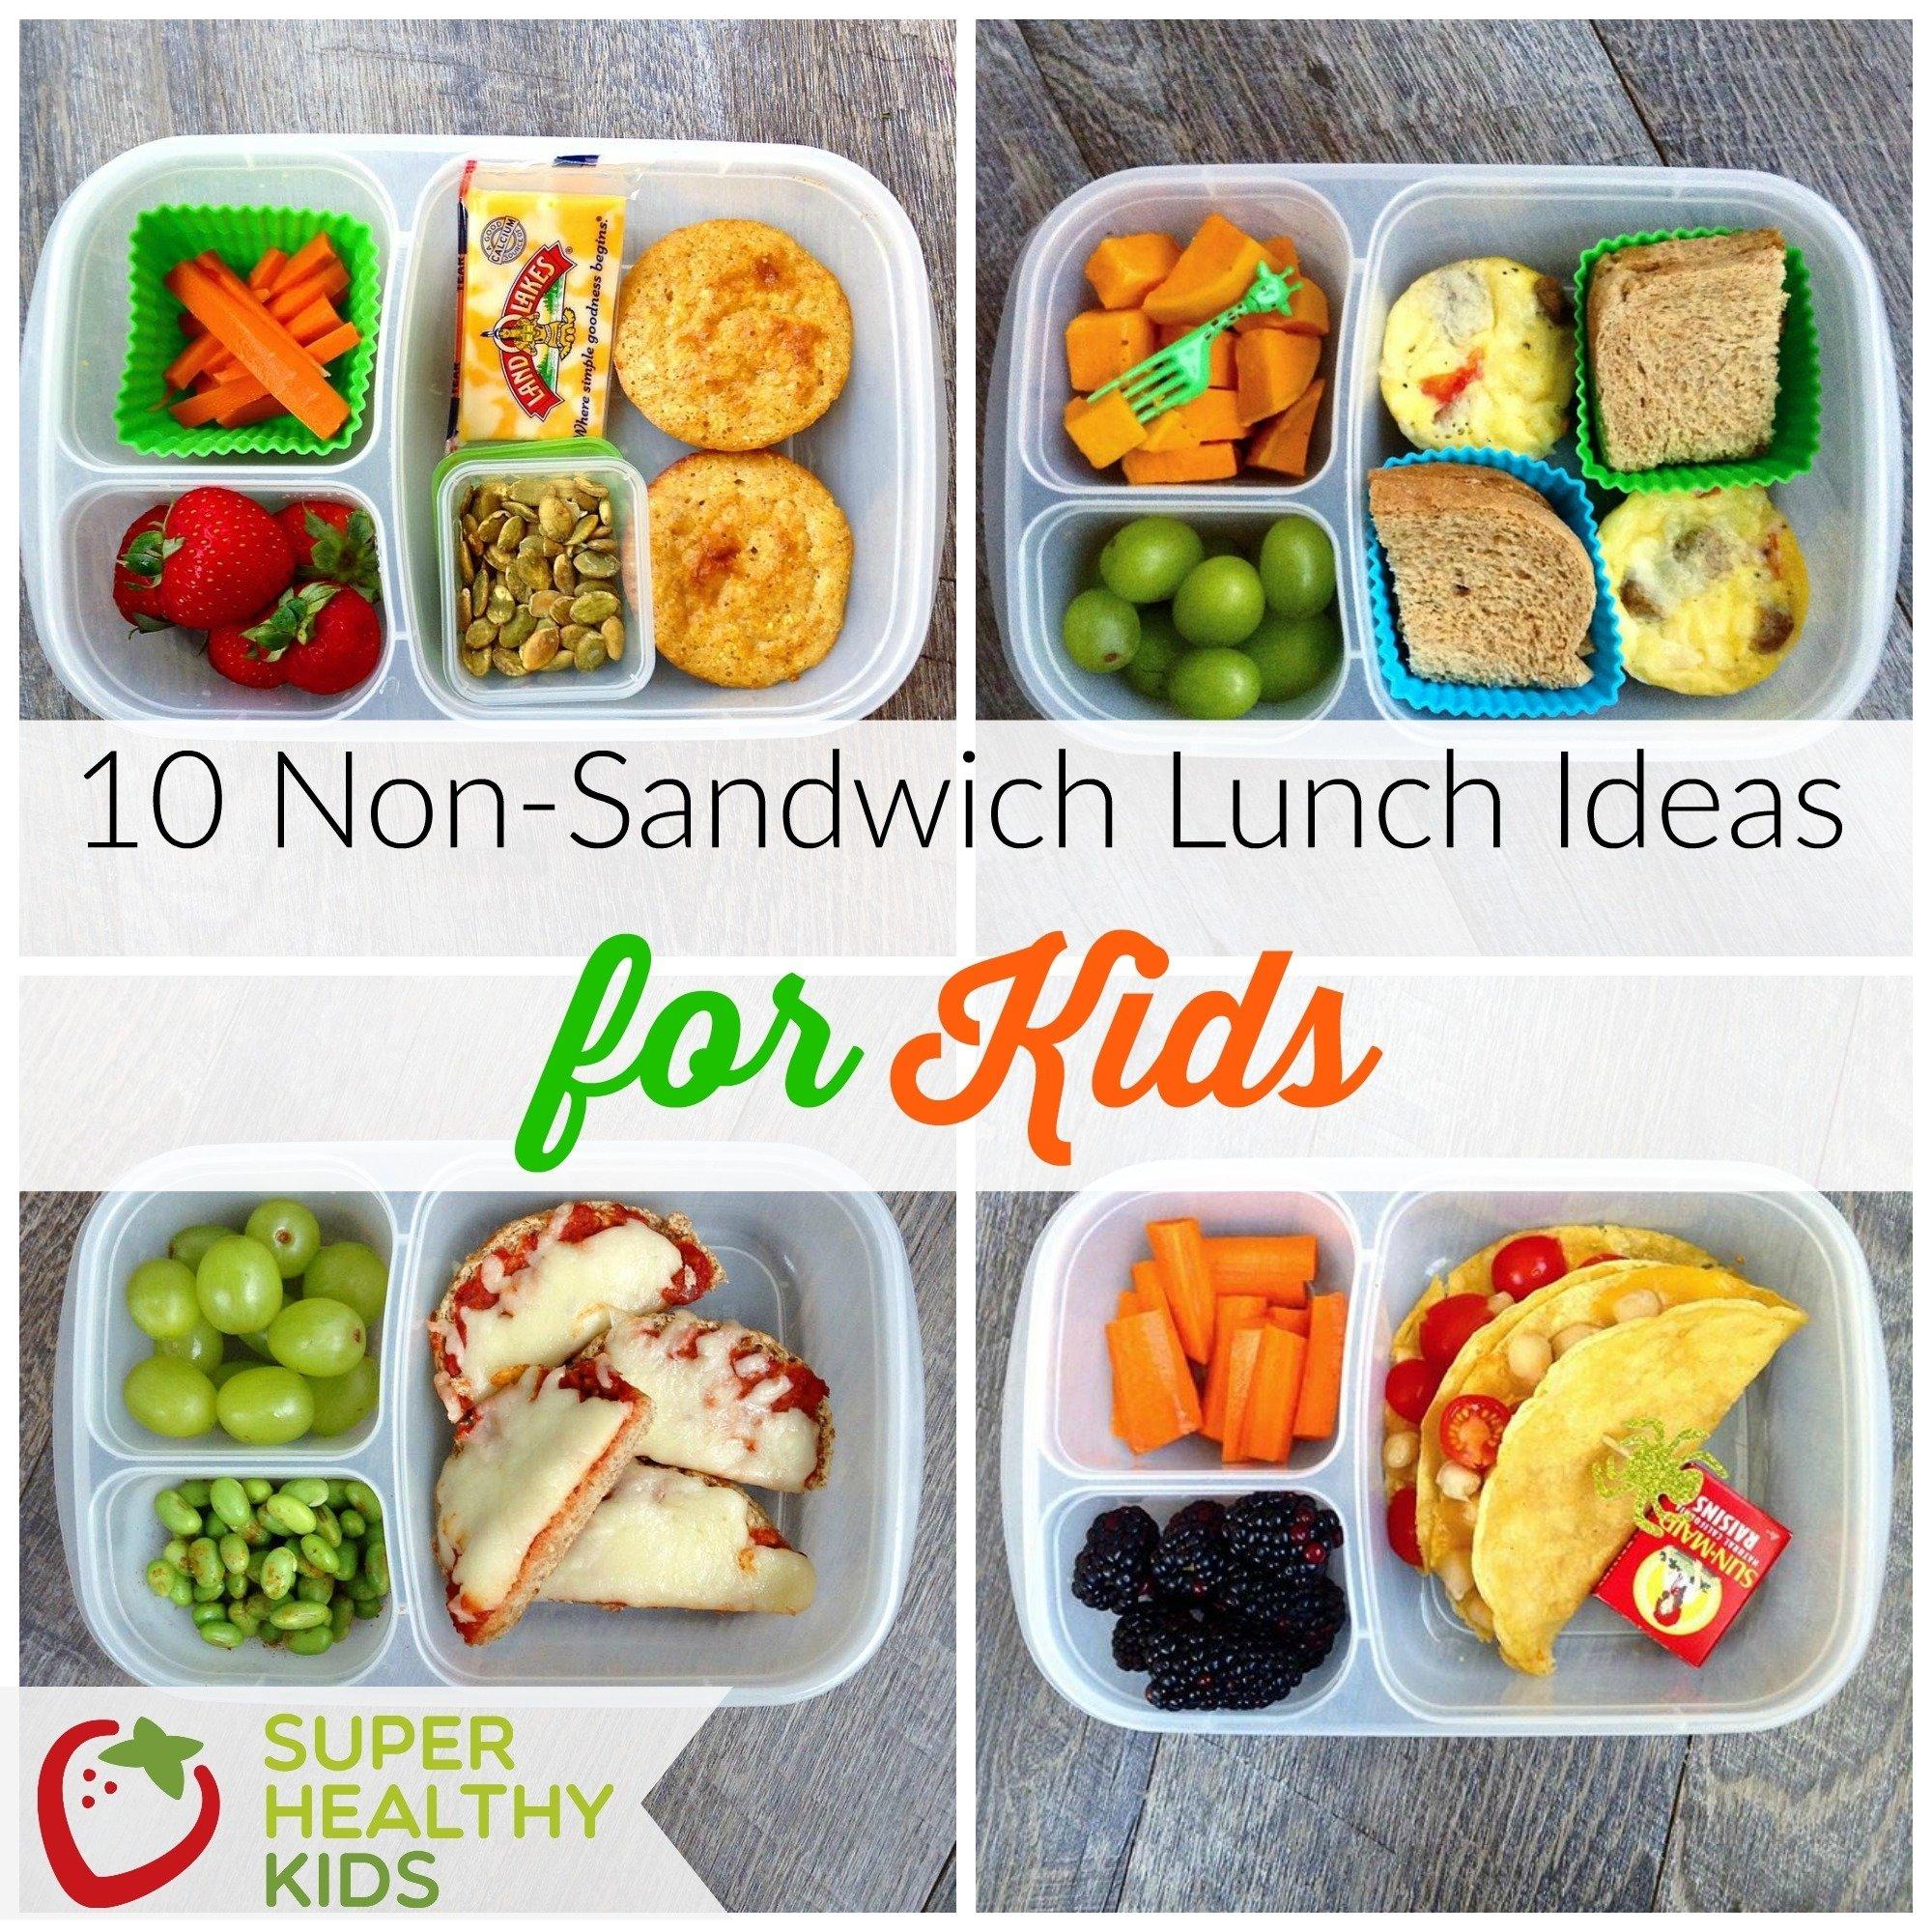 10 Trendy Good Breakfast Ideas For Kids 10 non sandwich lunch ideas for kids healthy ideas for kids 12 2021